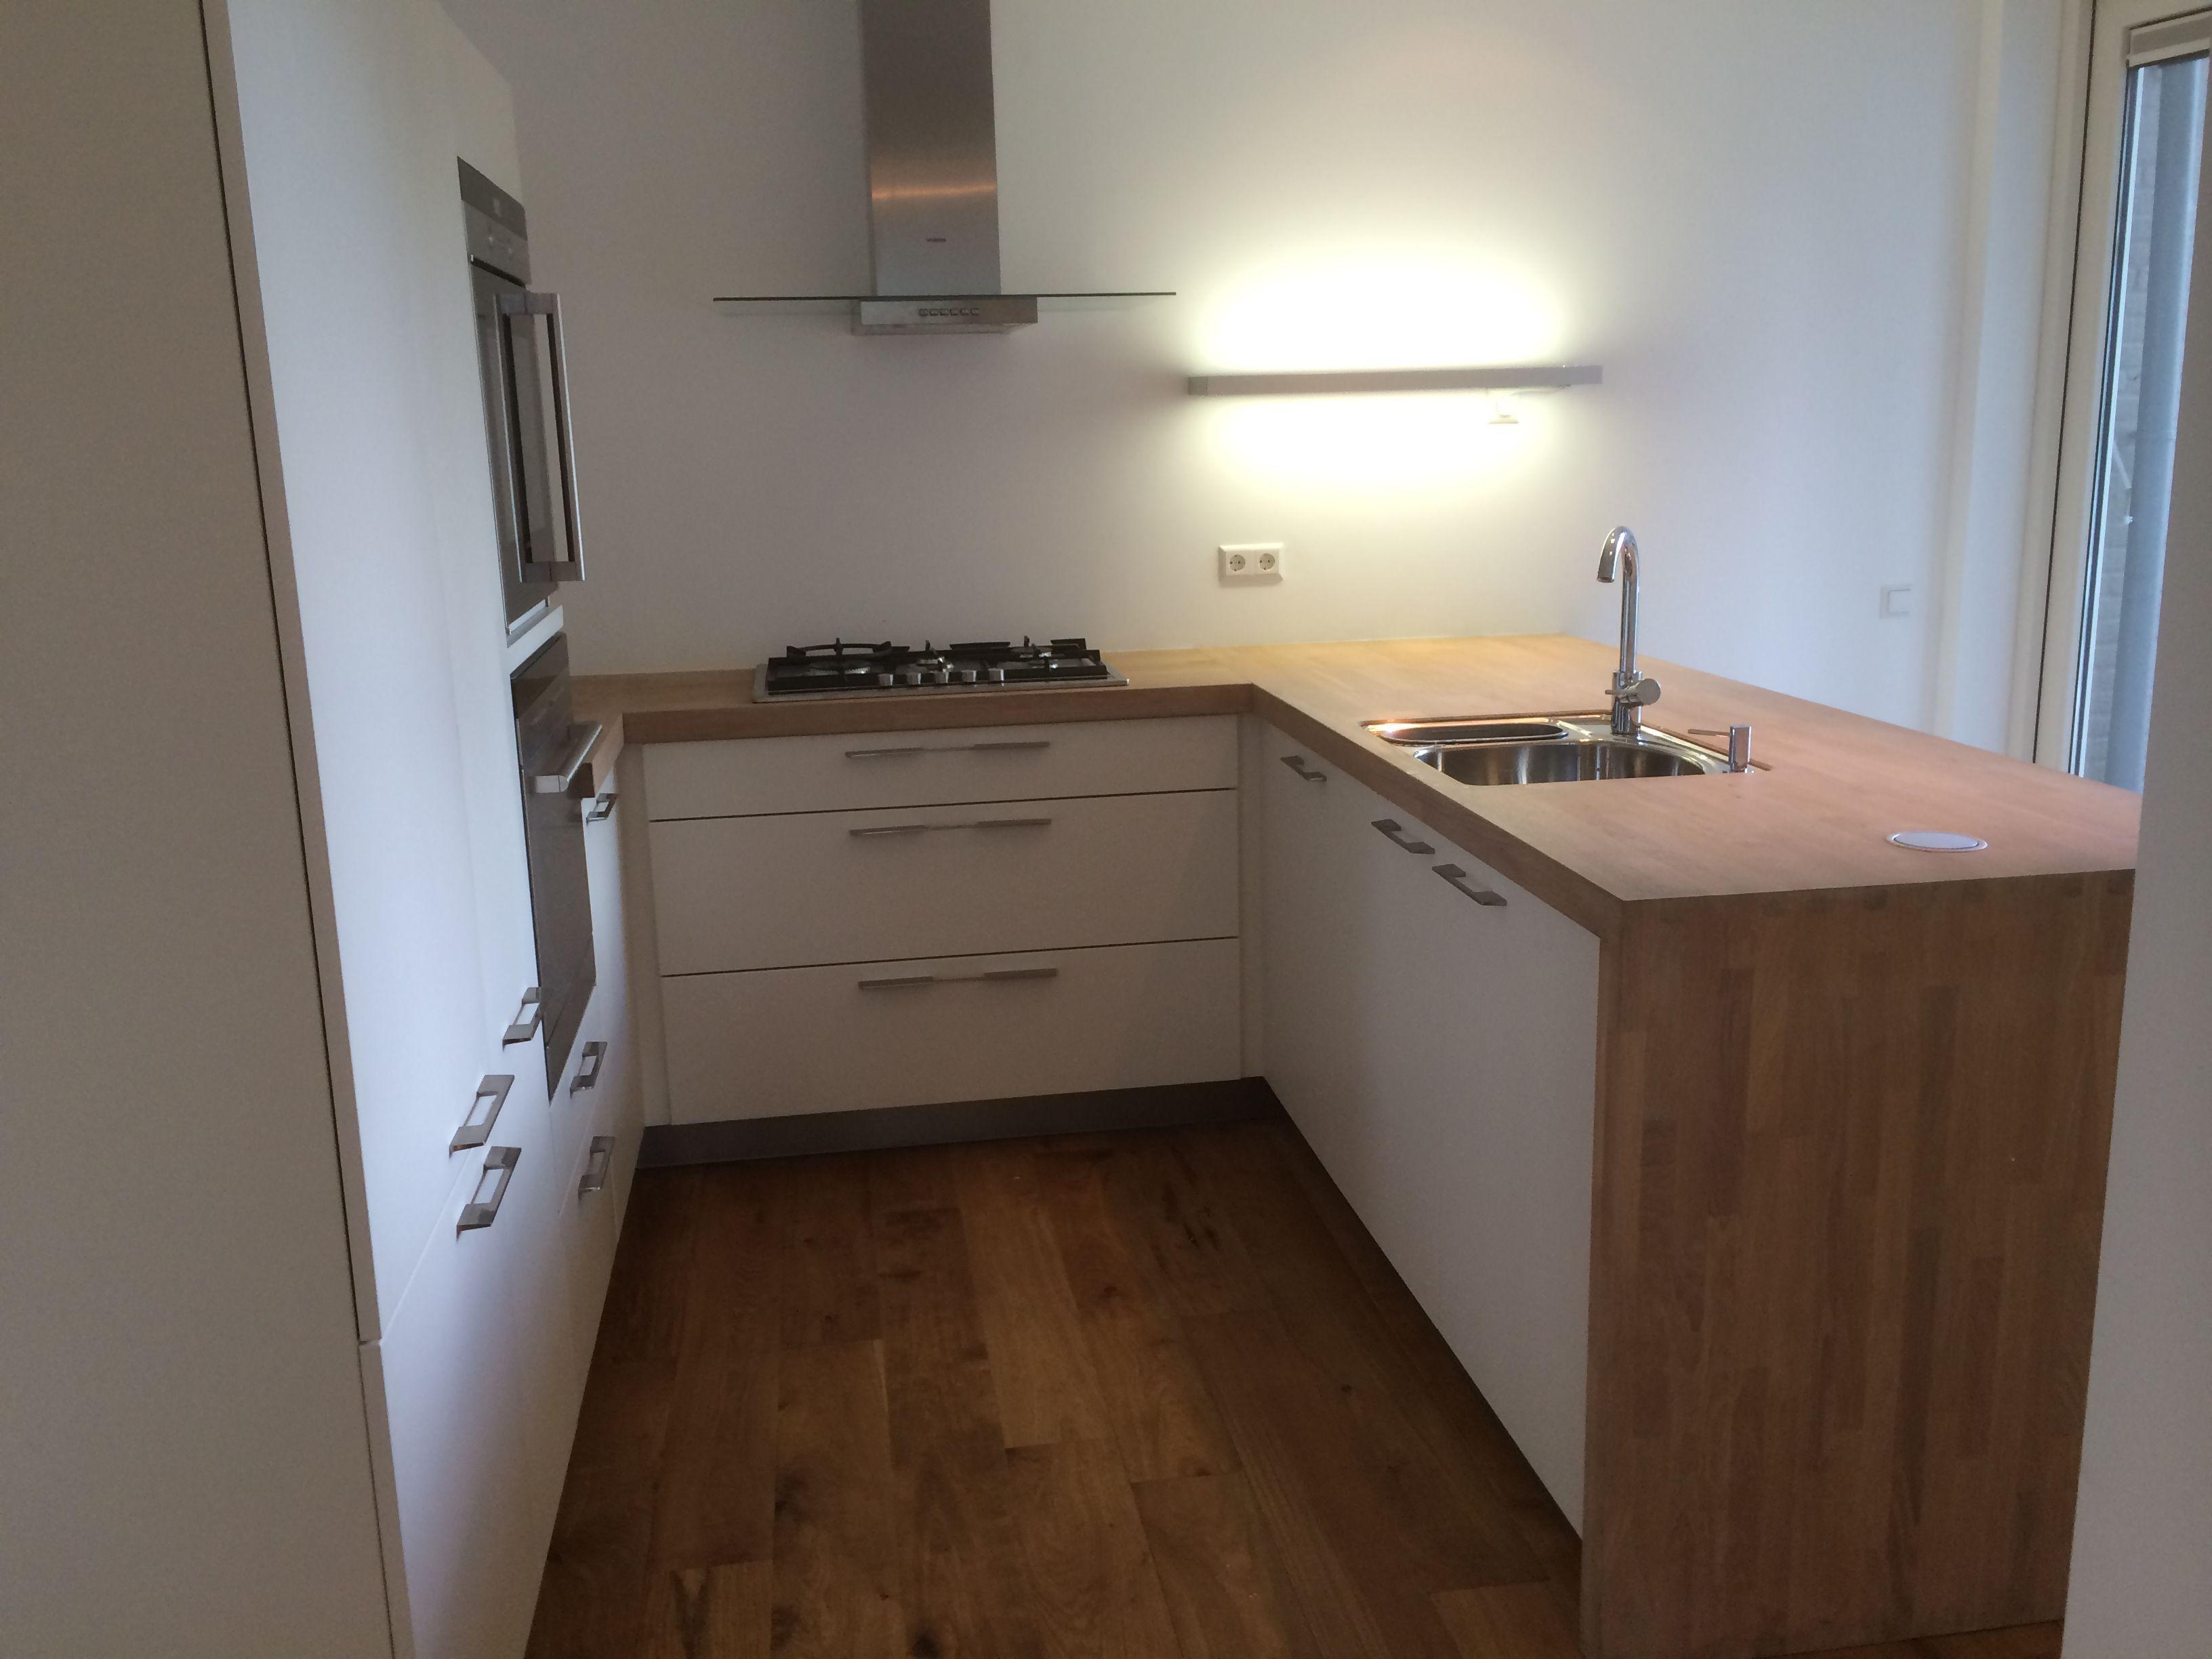 Kvik keuken google zoeken kvik keukens pinterest house - Idee outs semi open keuken ...